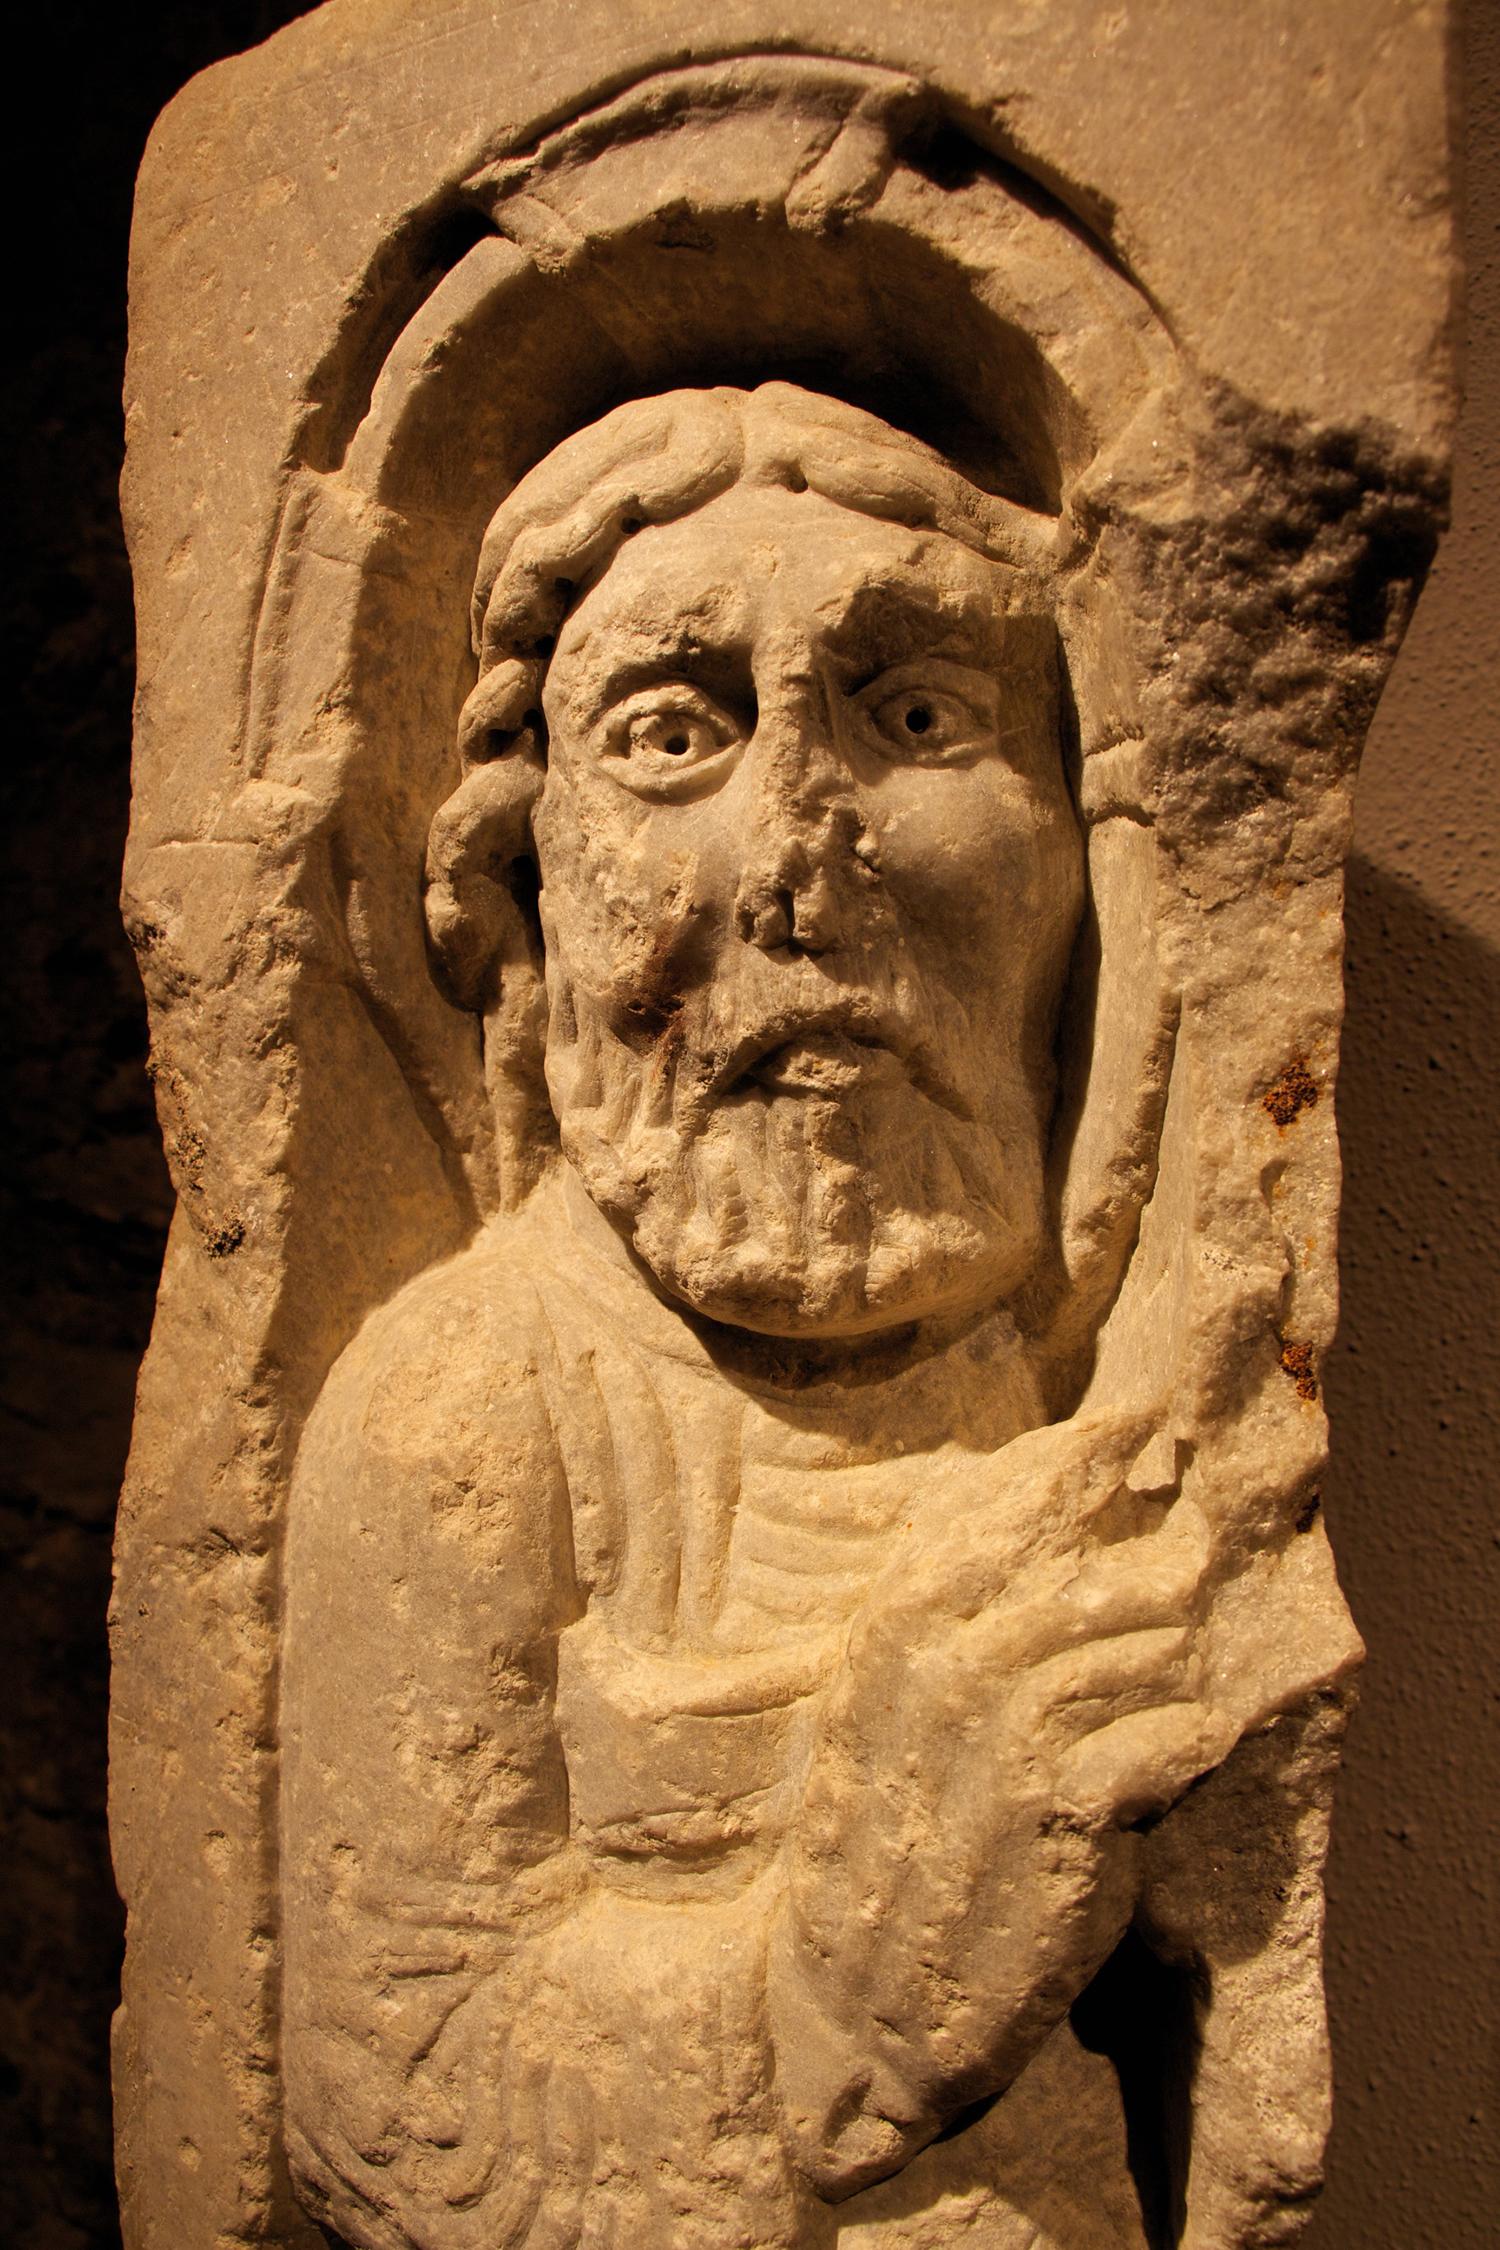 Figure 2: Christ raises his right hand.